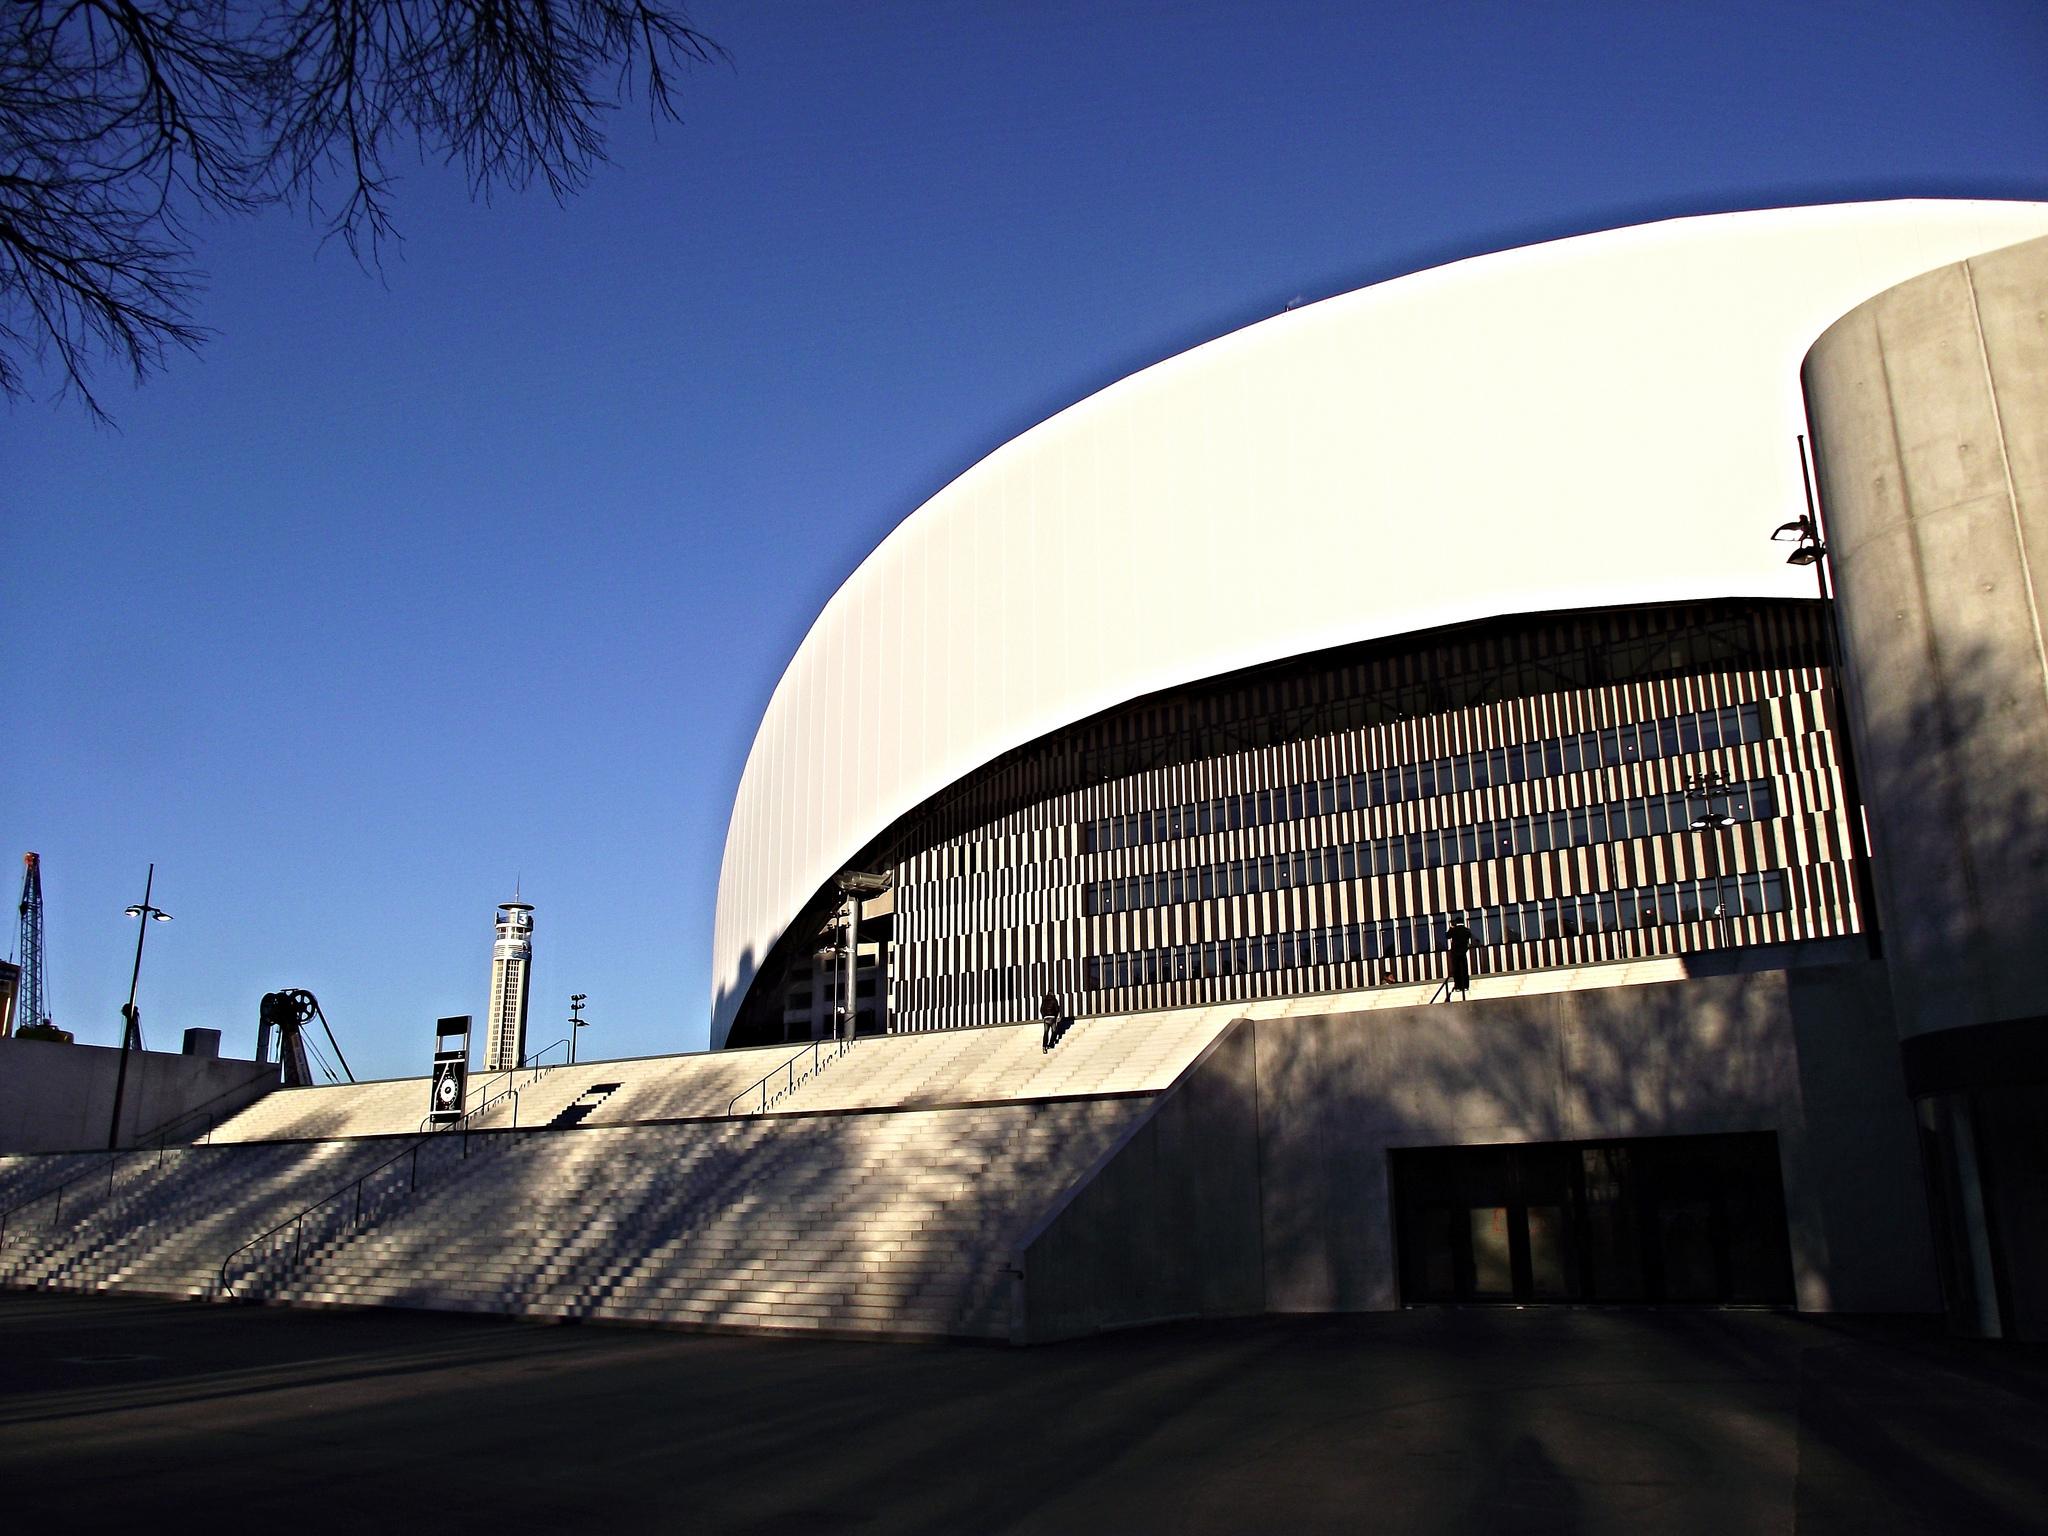 Stade Velodrome de Marseille